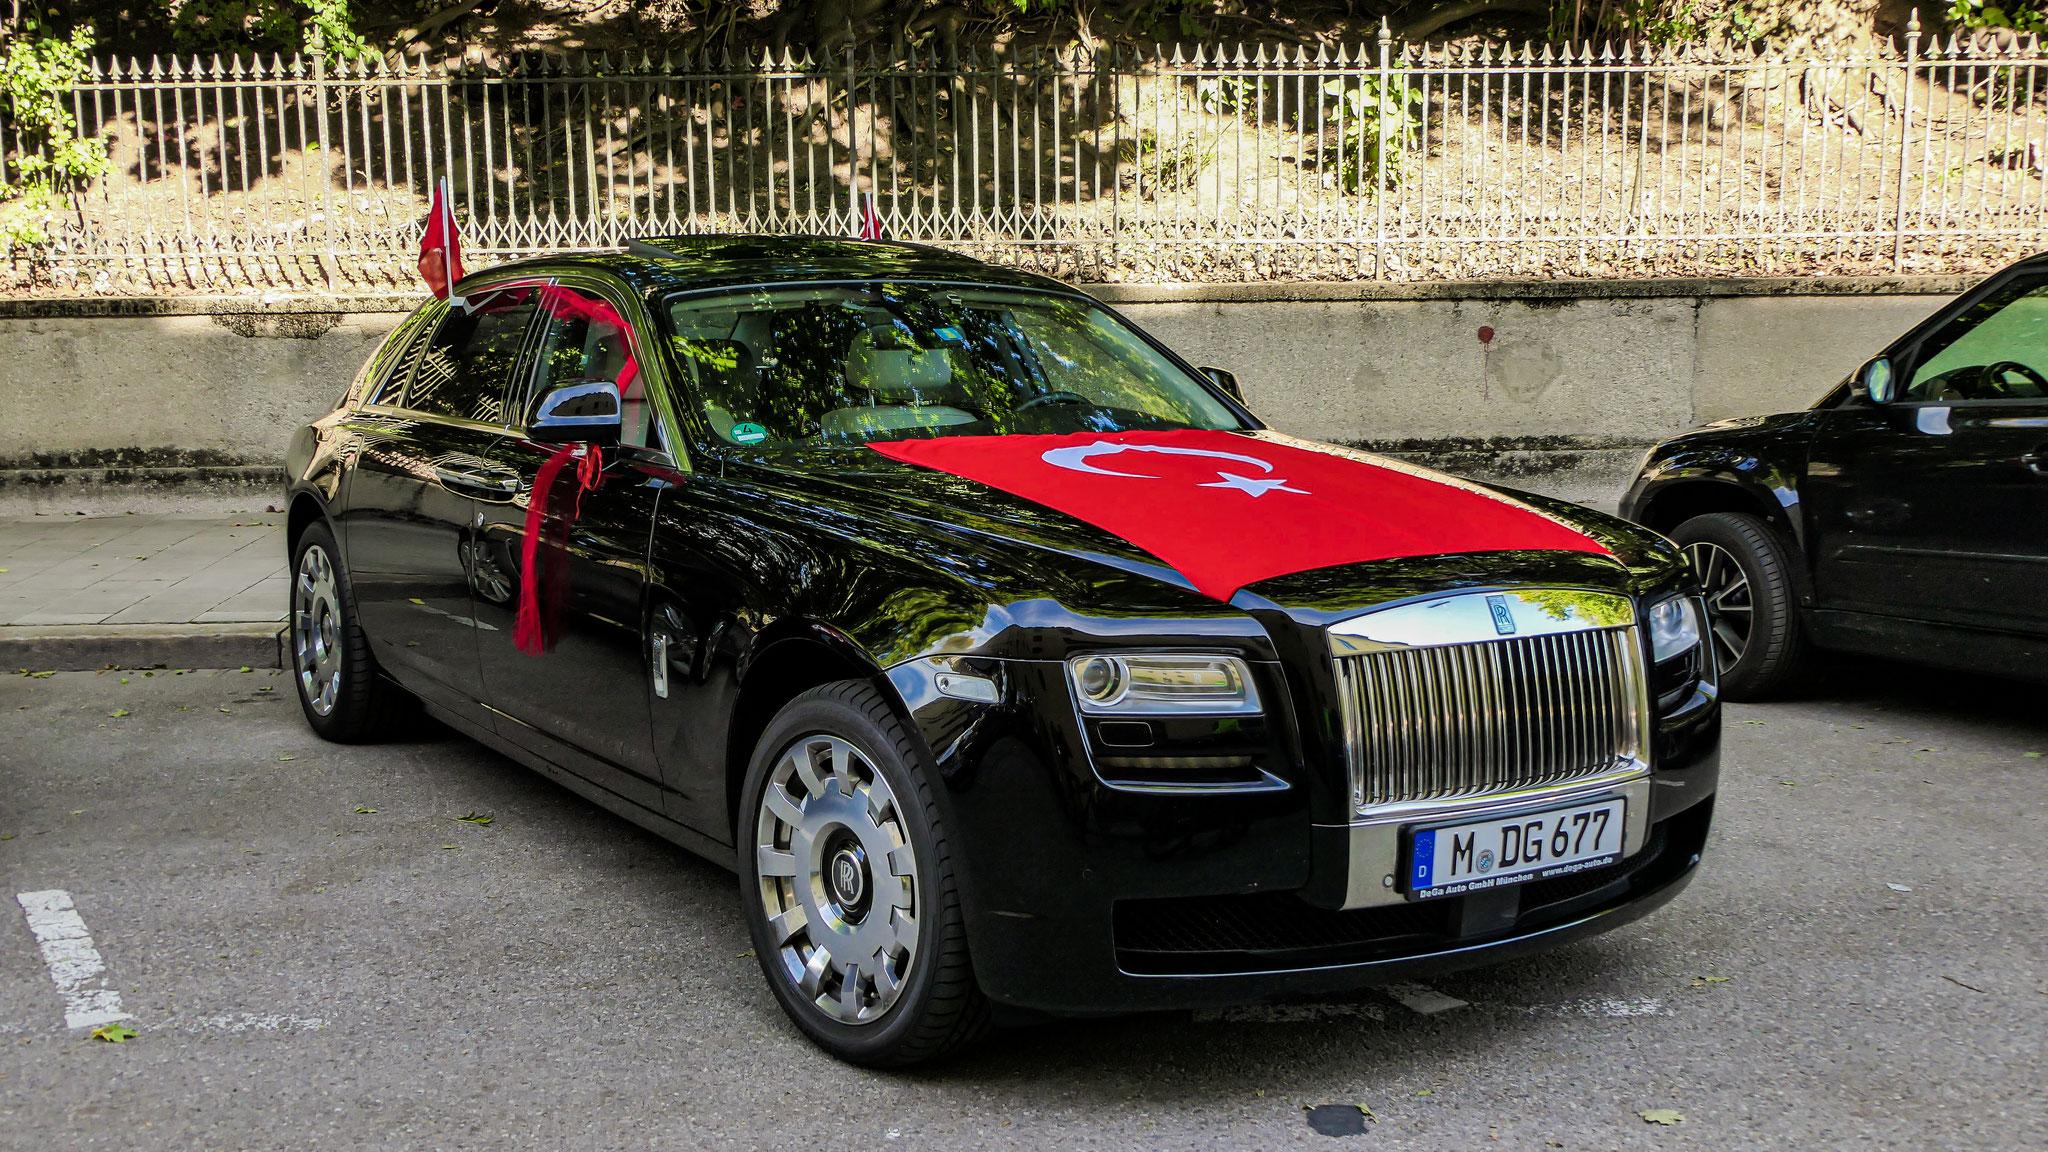 Rolls Royce Ghost - M-DG-677